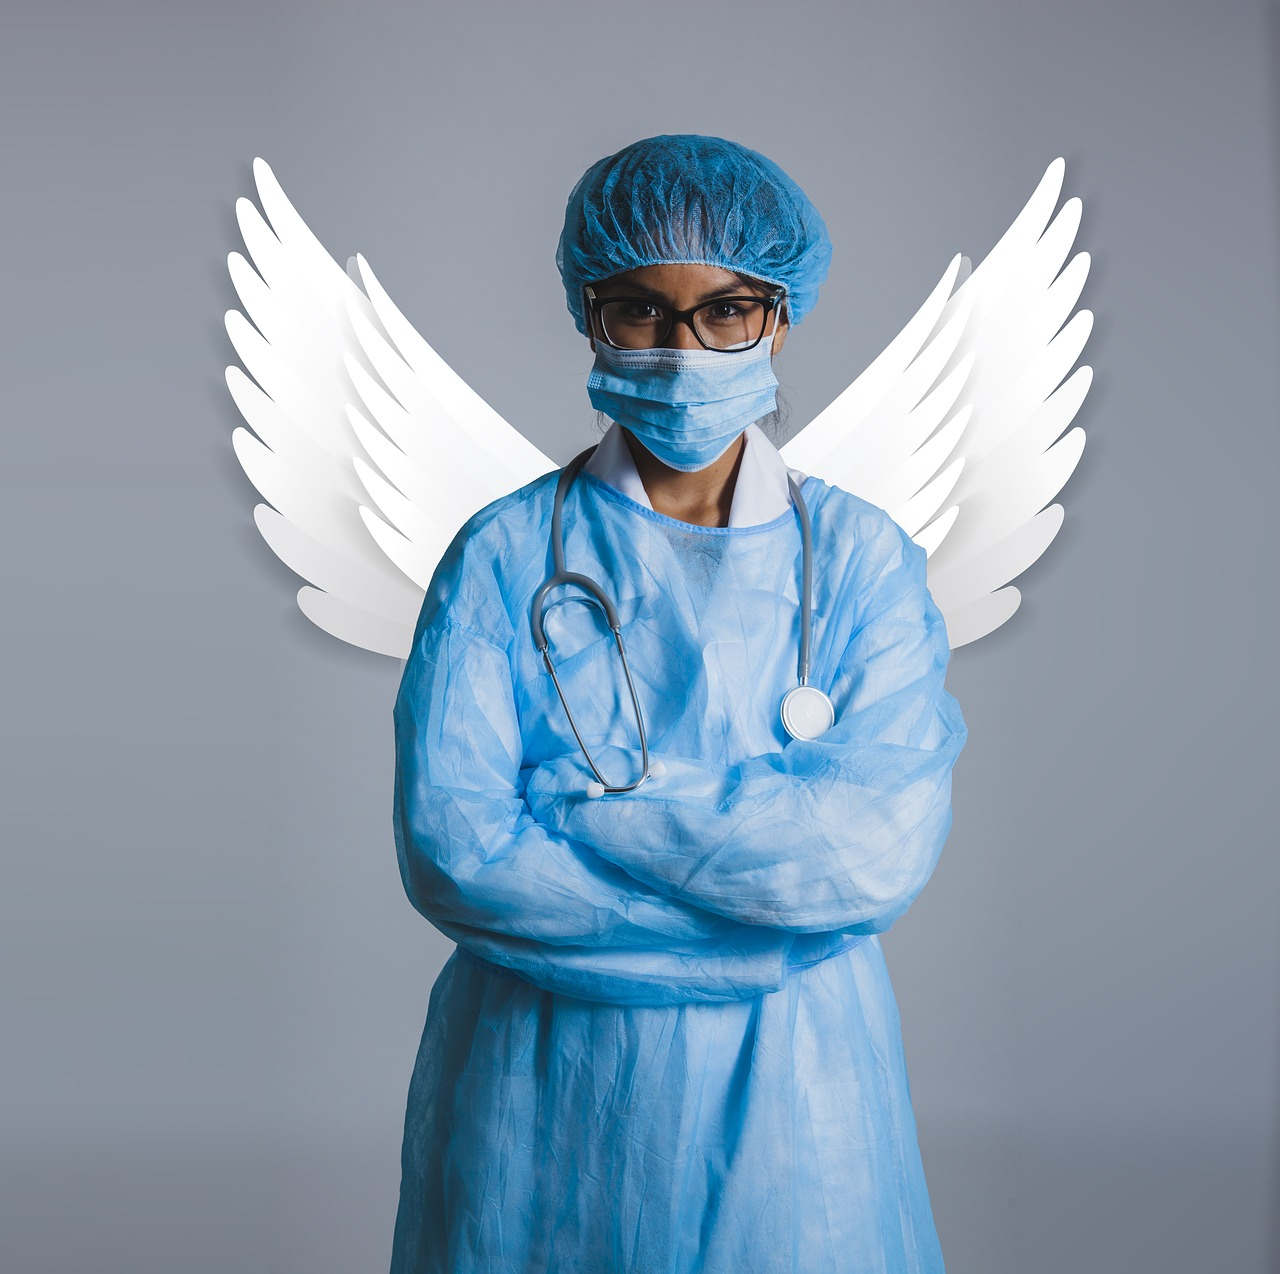 Ce inseamna sa fii un doctor bun?